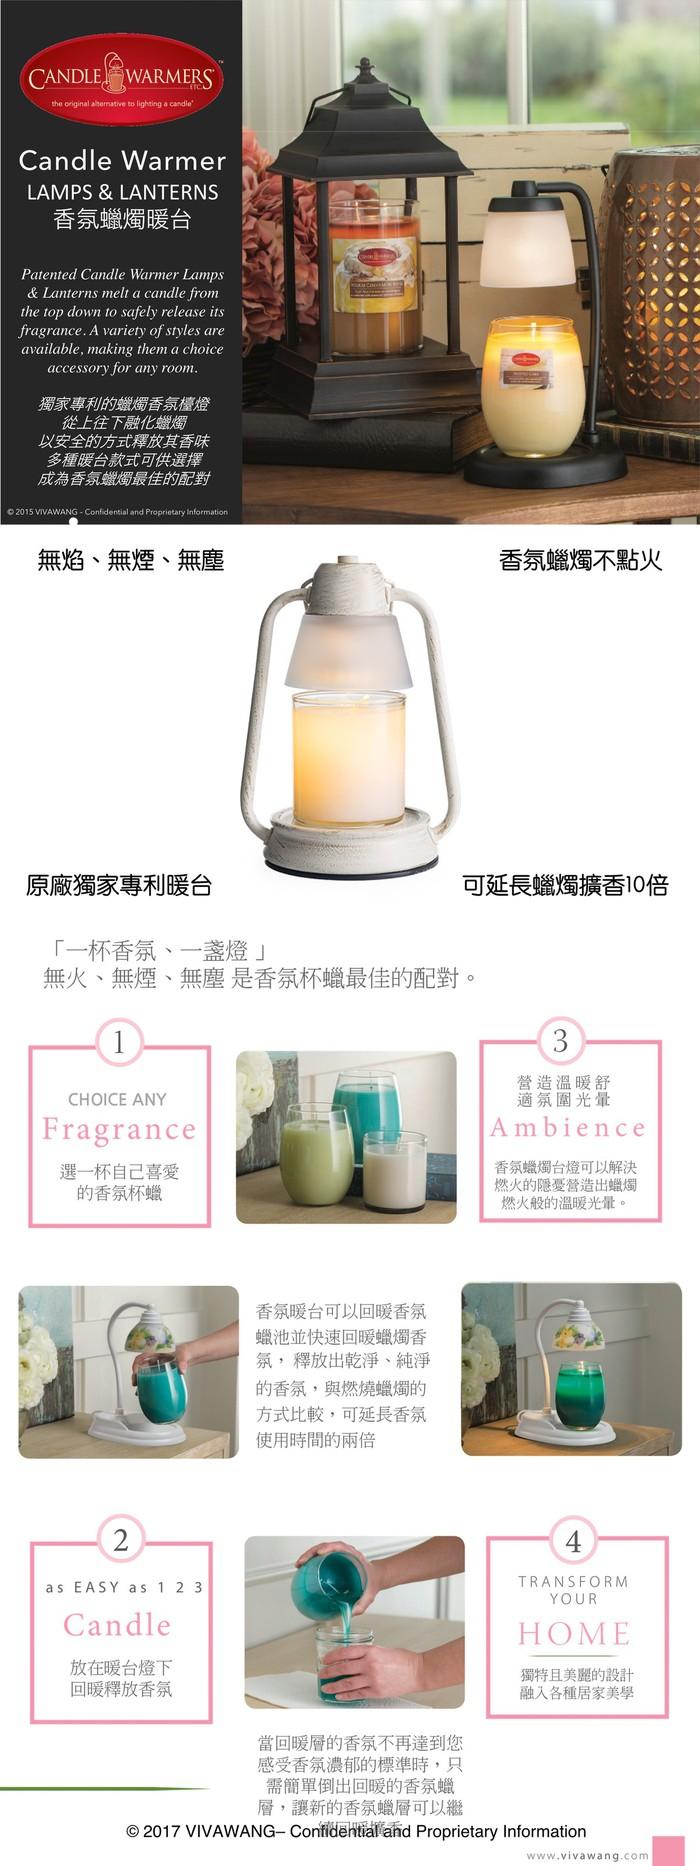 Candle Warmers|香氛擴香暖台 精巧暖檯燈(仿刷浮木白)